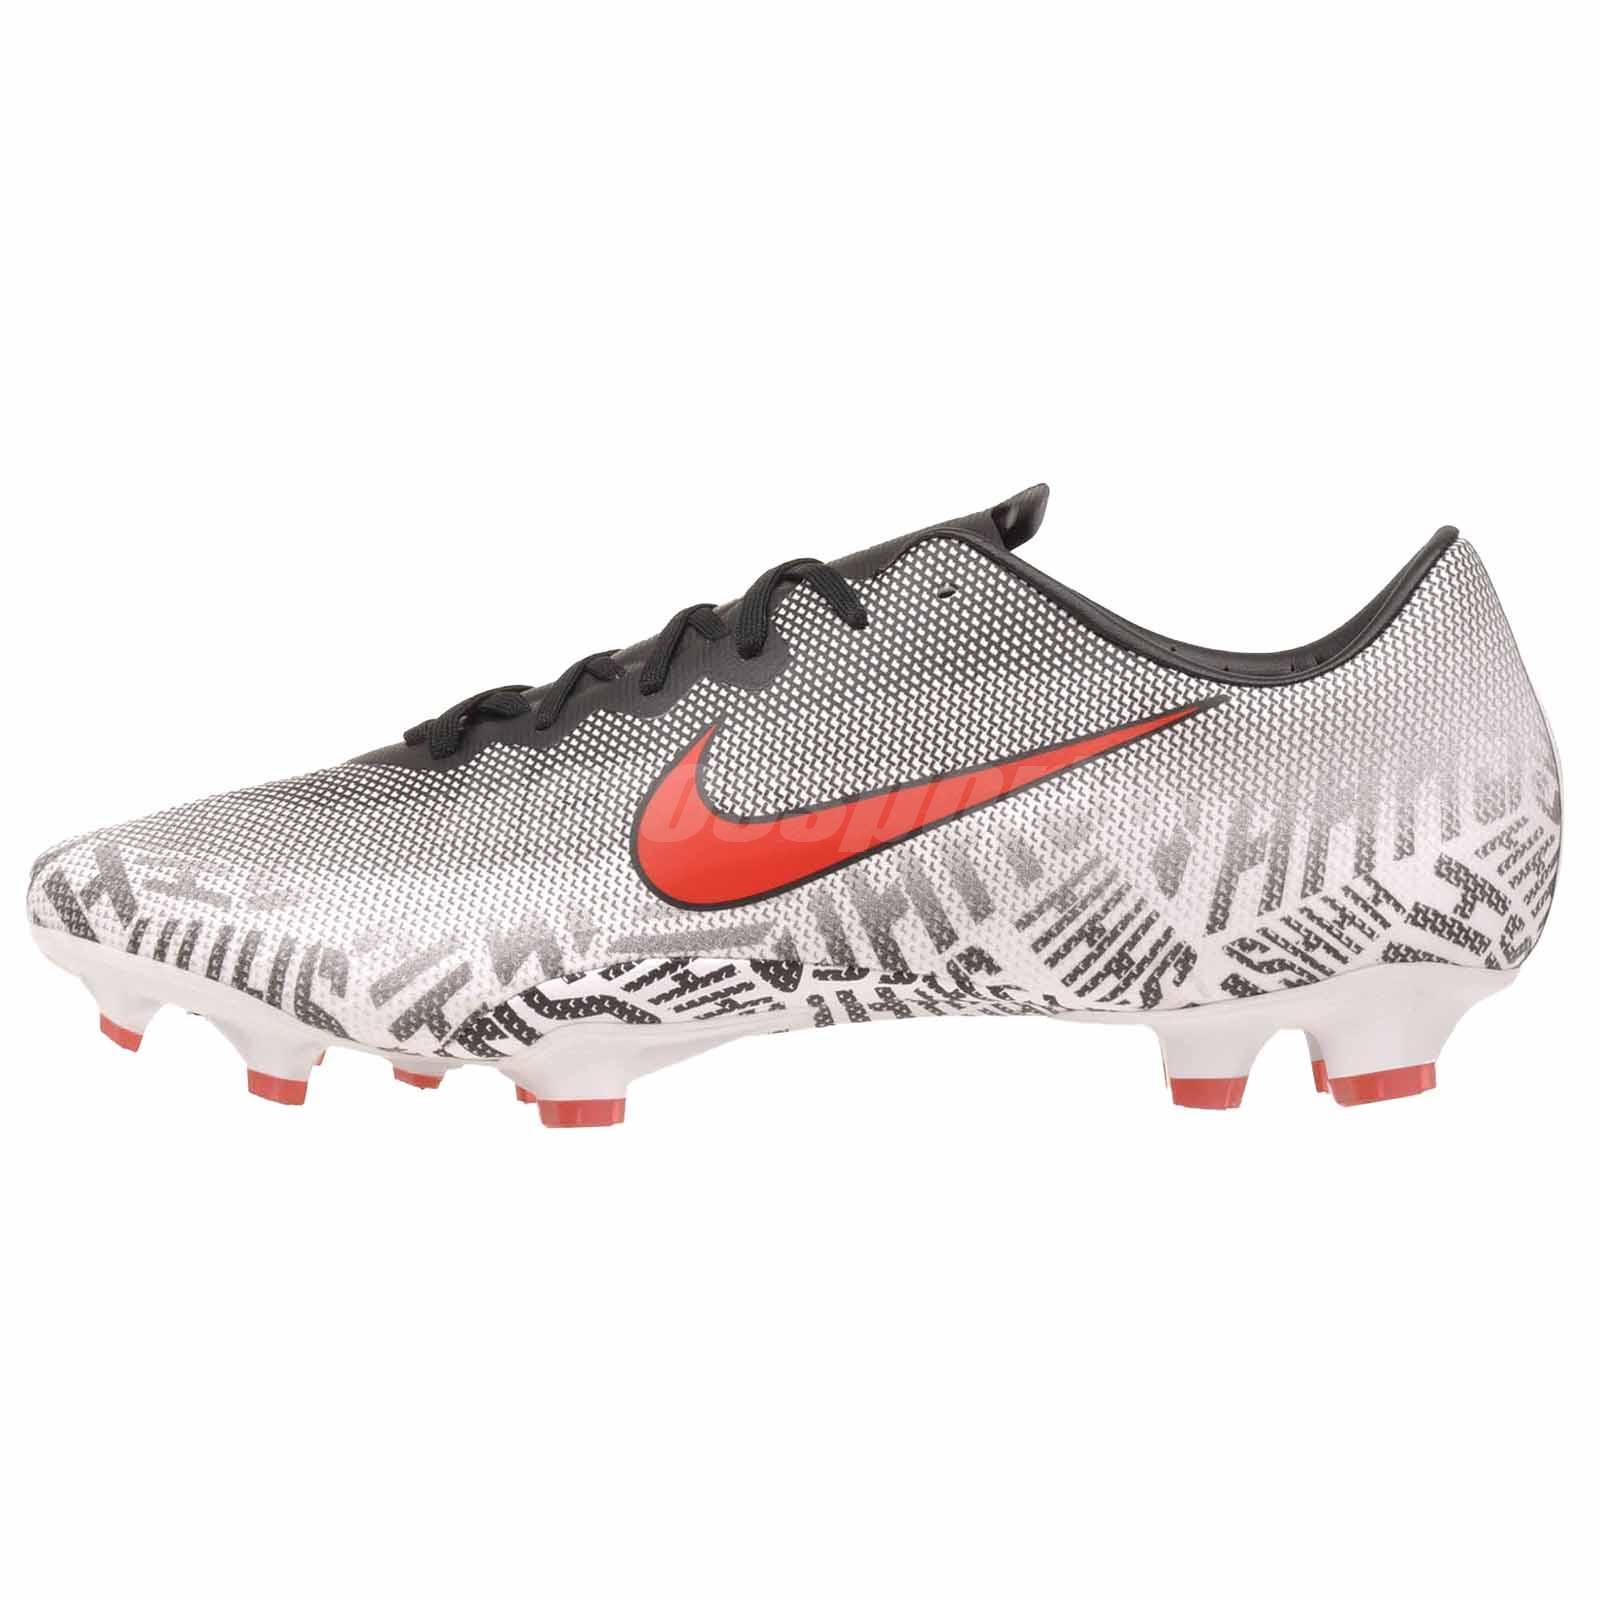 habilitar Teseo portátil  Nike Vapor 12 Pro NJR FG Soccer Mens Cleats Shoes Neymar AO3123-170 | eBay